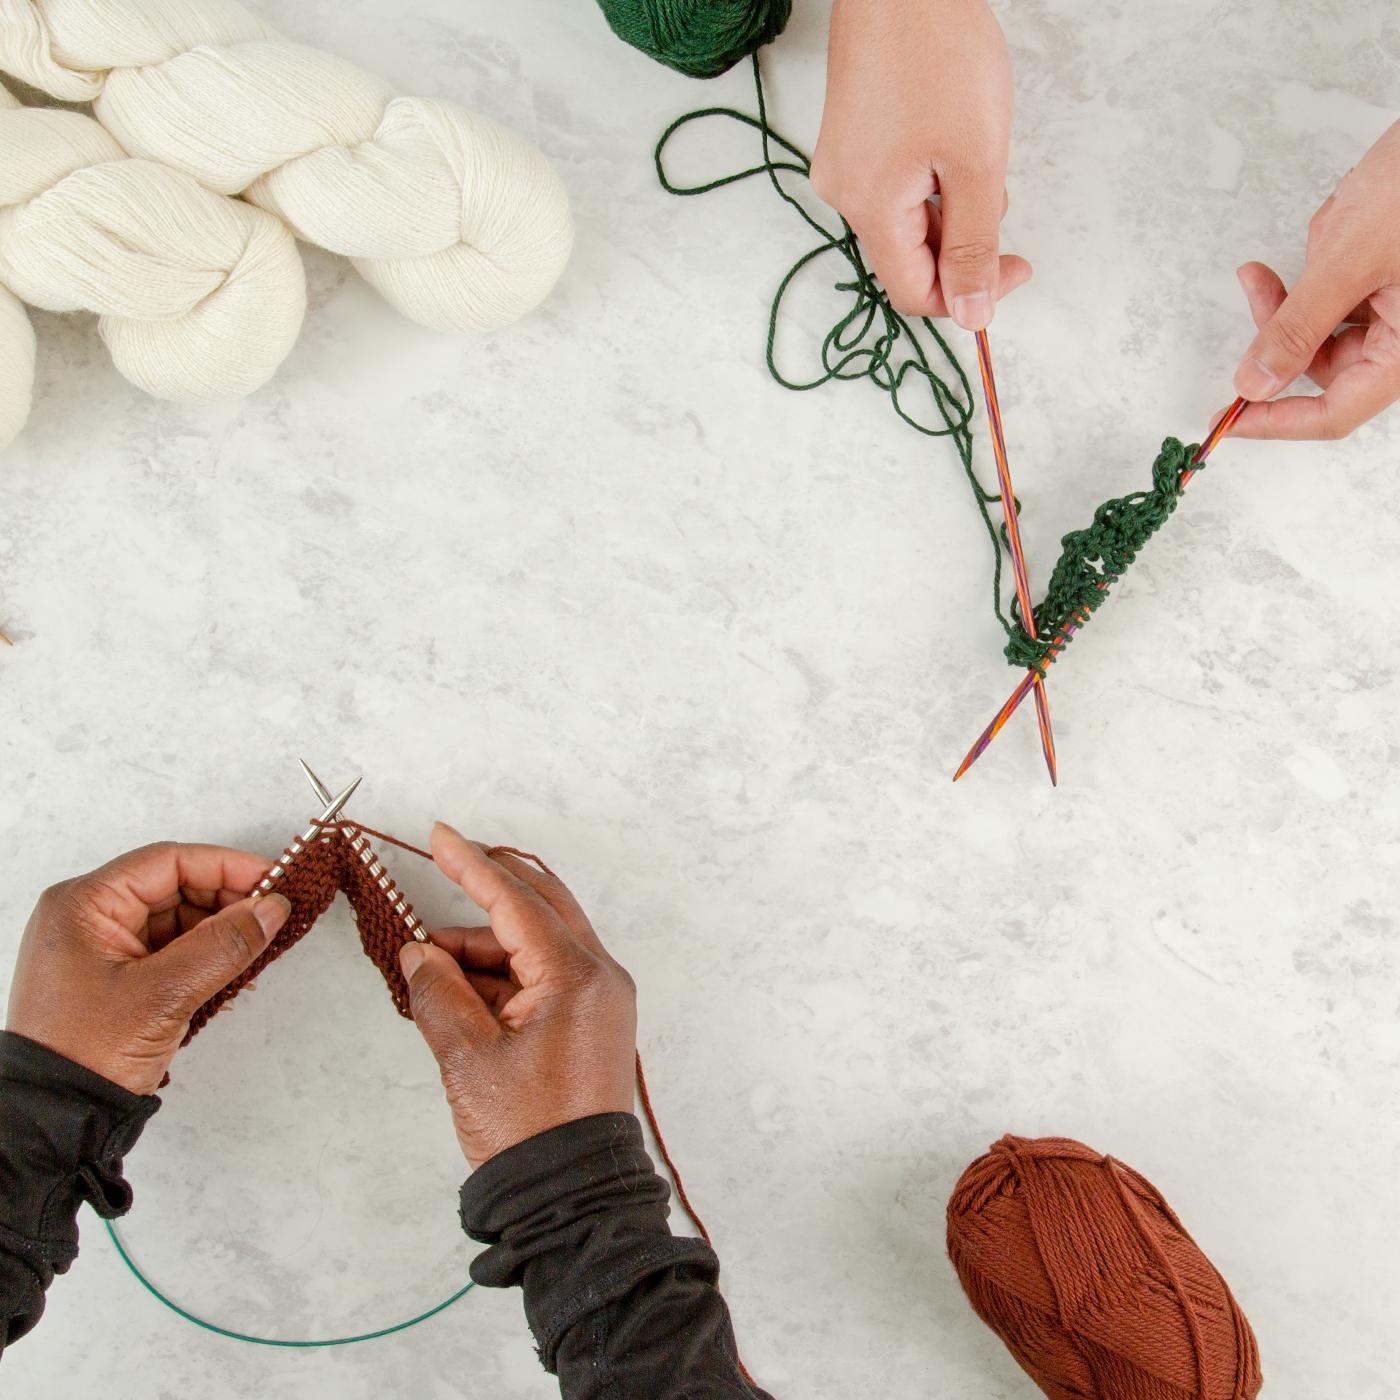 Episode 347 - Learning & Teaching Yarn Crafts